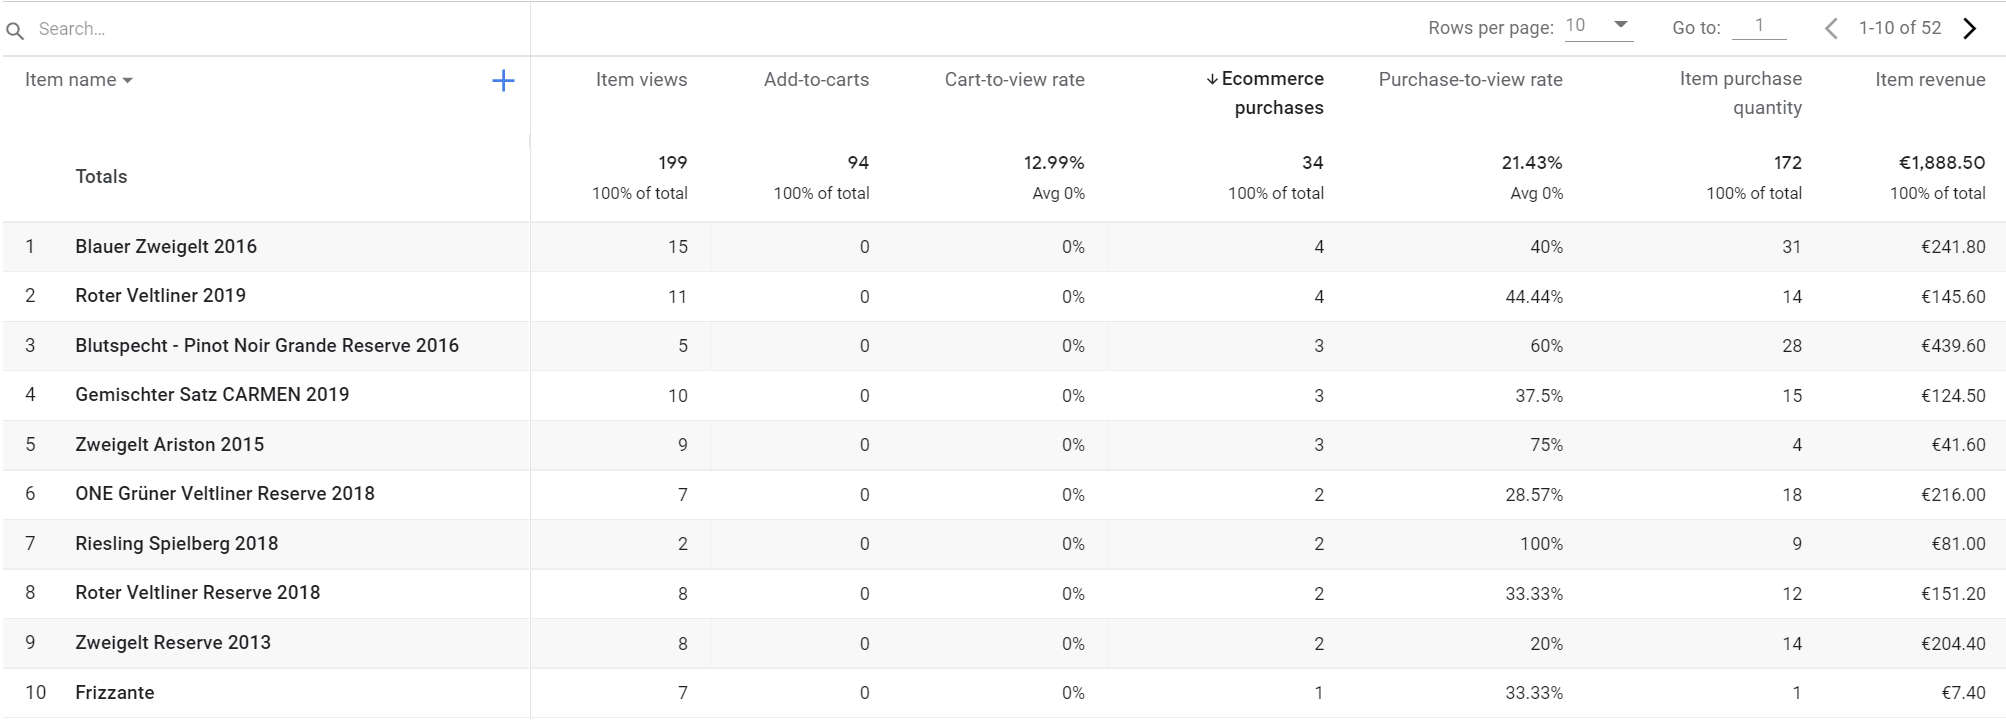 Google Analytics 4 Product Performance Report